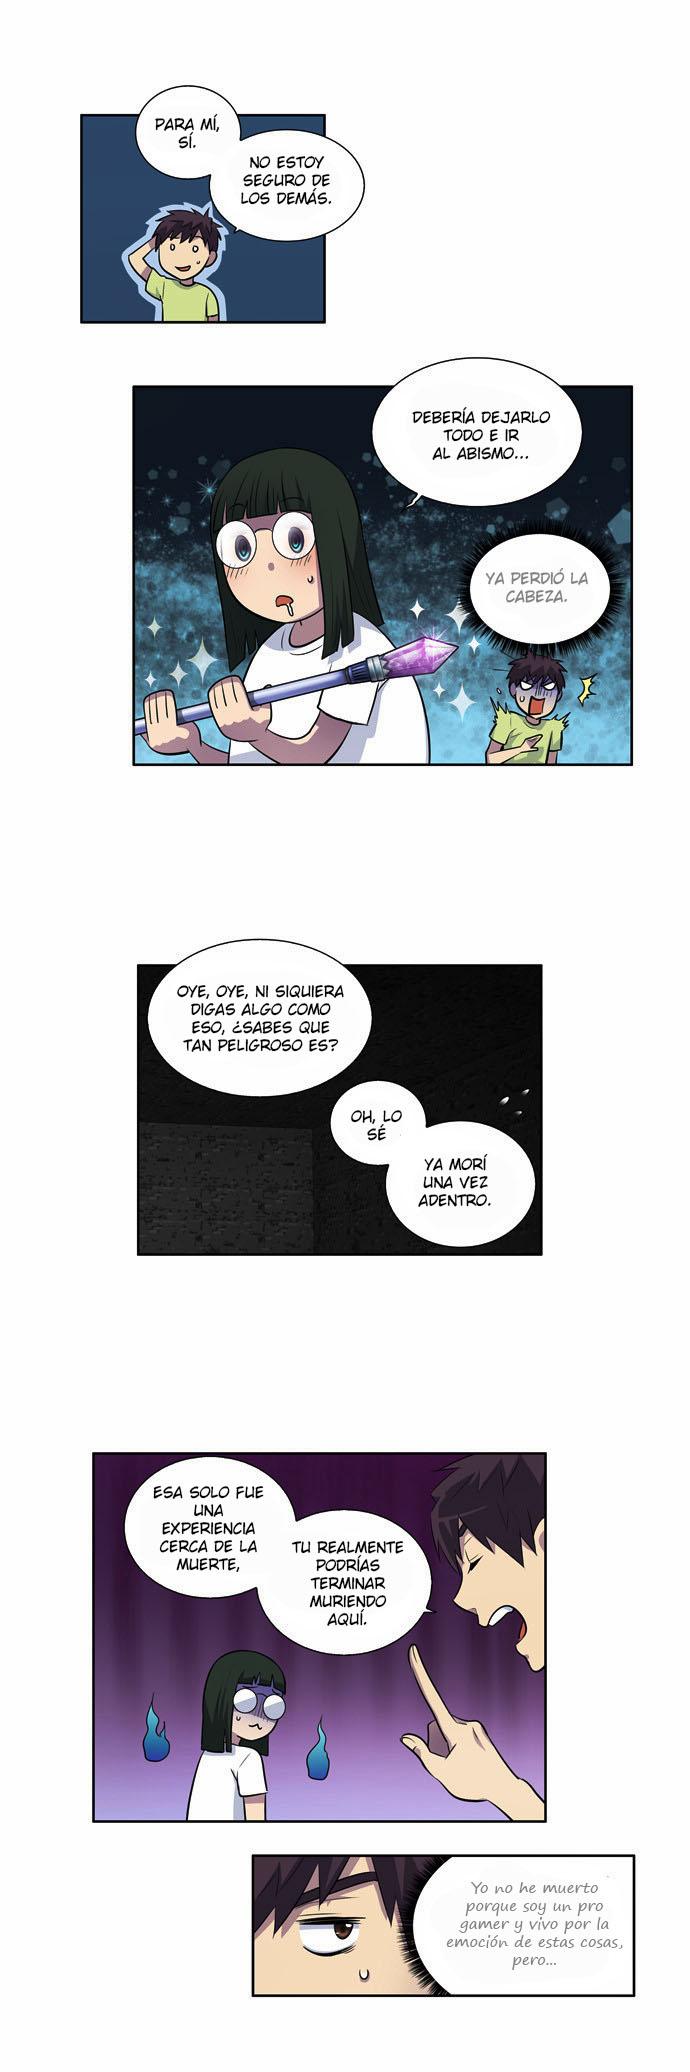 http://c5.ninemanga.com/es_manga/61/1725/434275/7a46f9aaf612c86459b1604f6383aebd.jpg Page 20